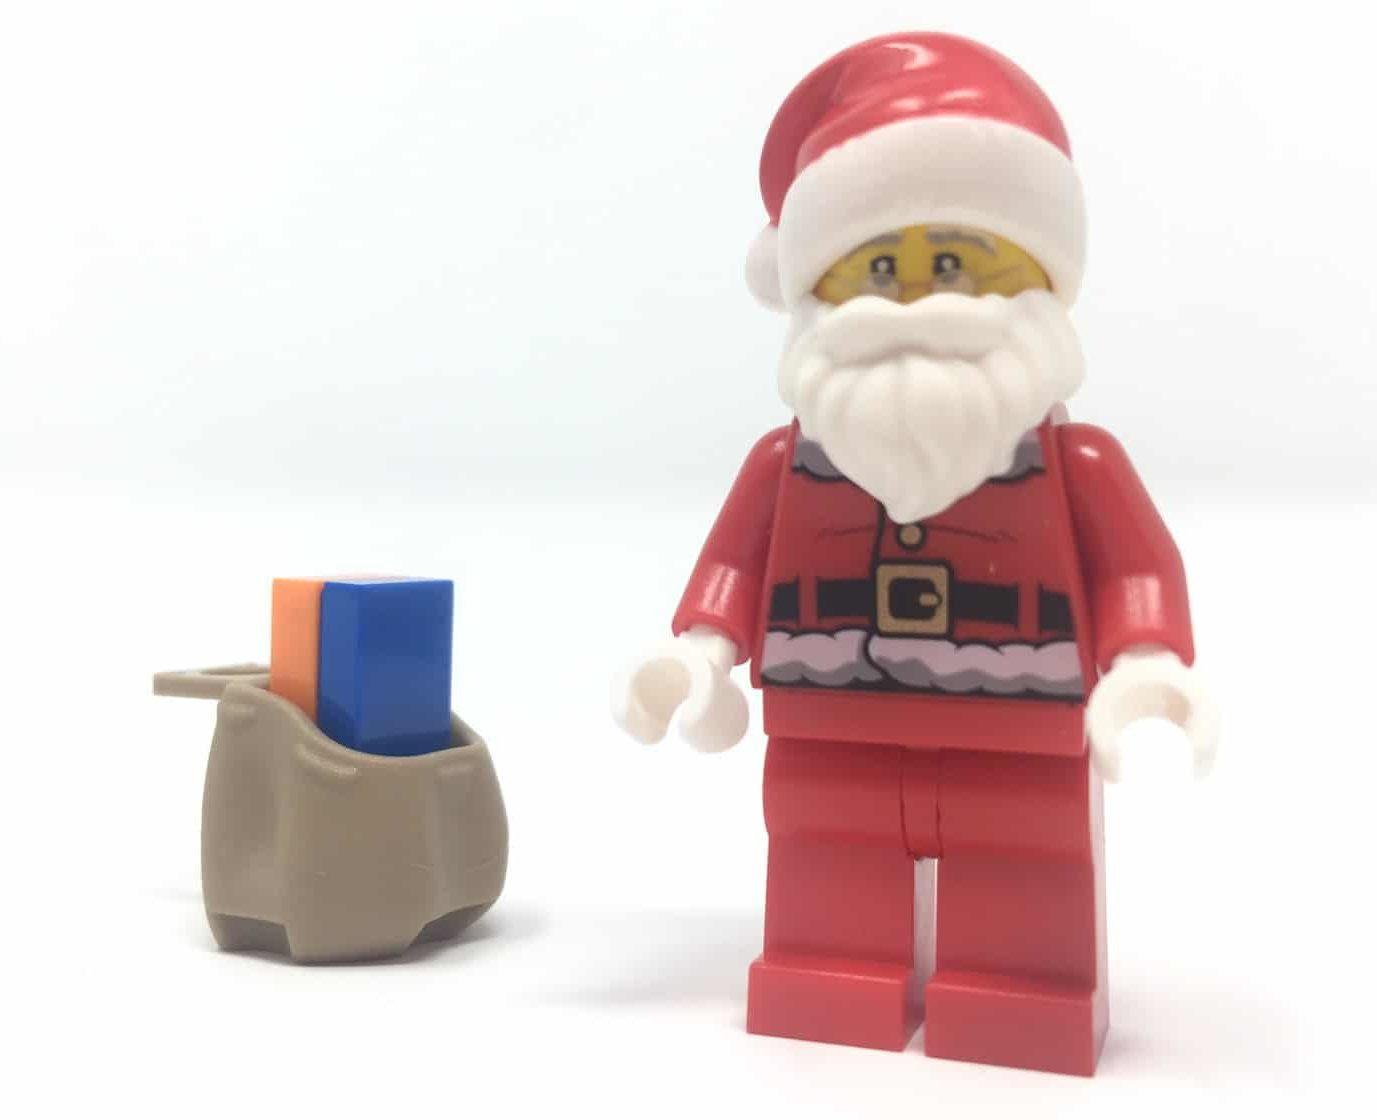 LEGO 60235 City Adventskalender 2019 Tür 24